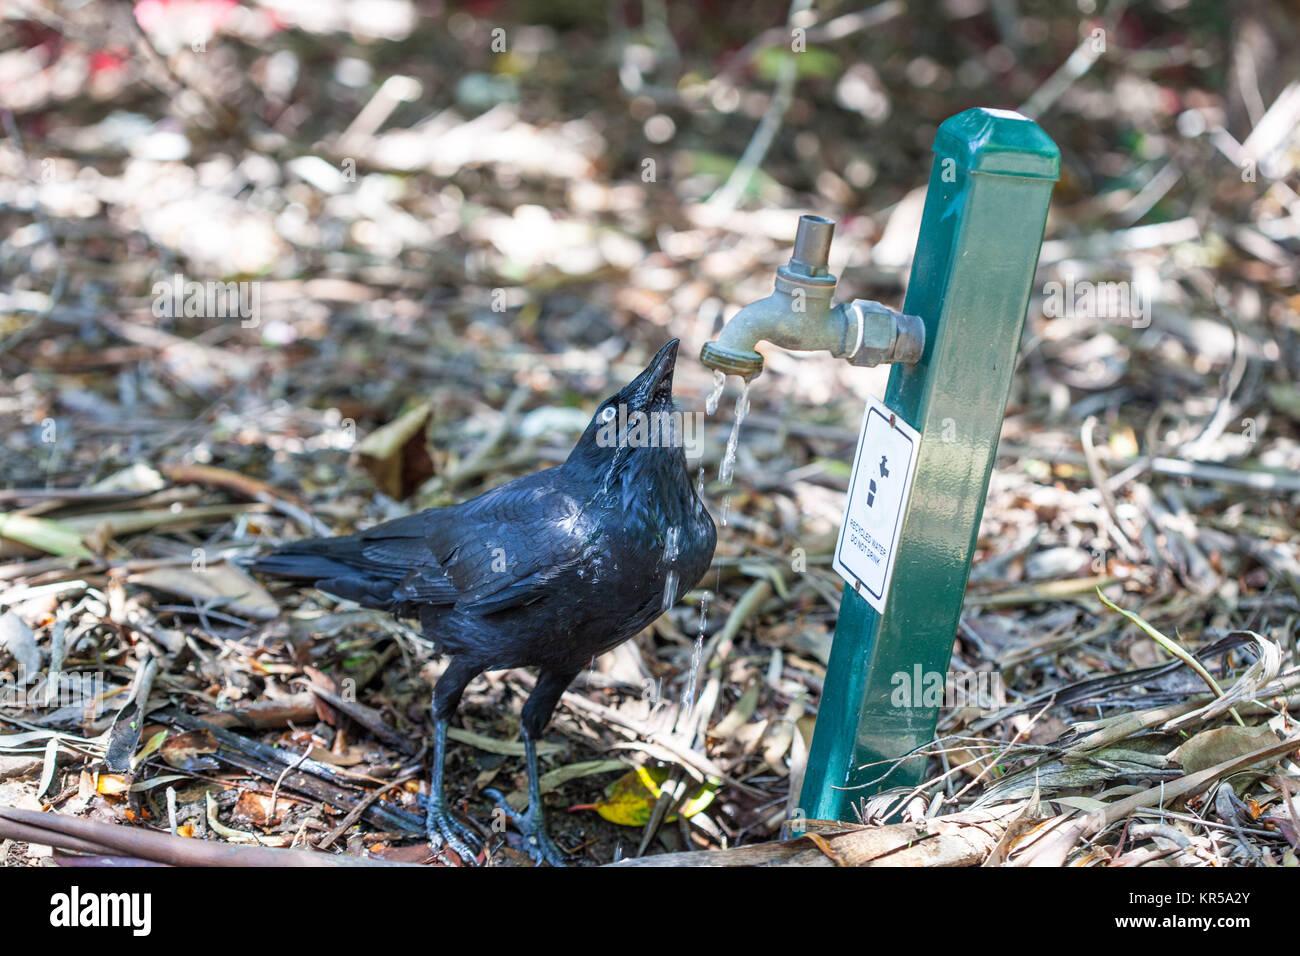 Black Australian Raven drinking water from tap - Stock Image